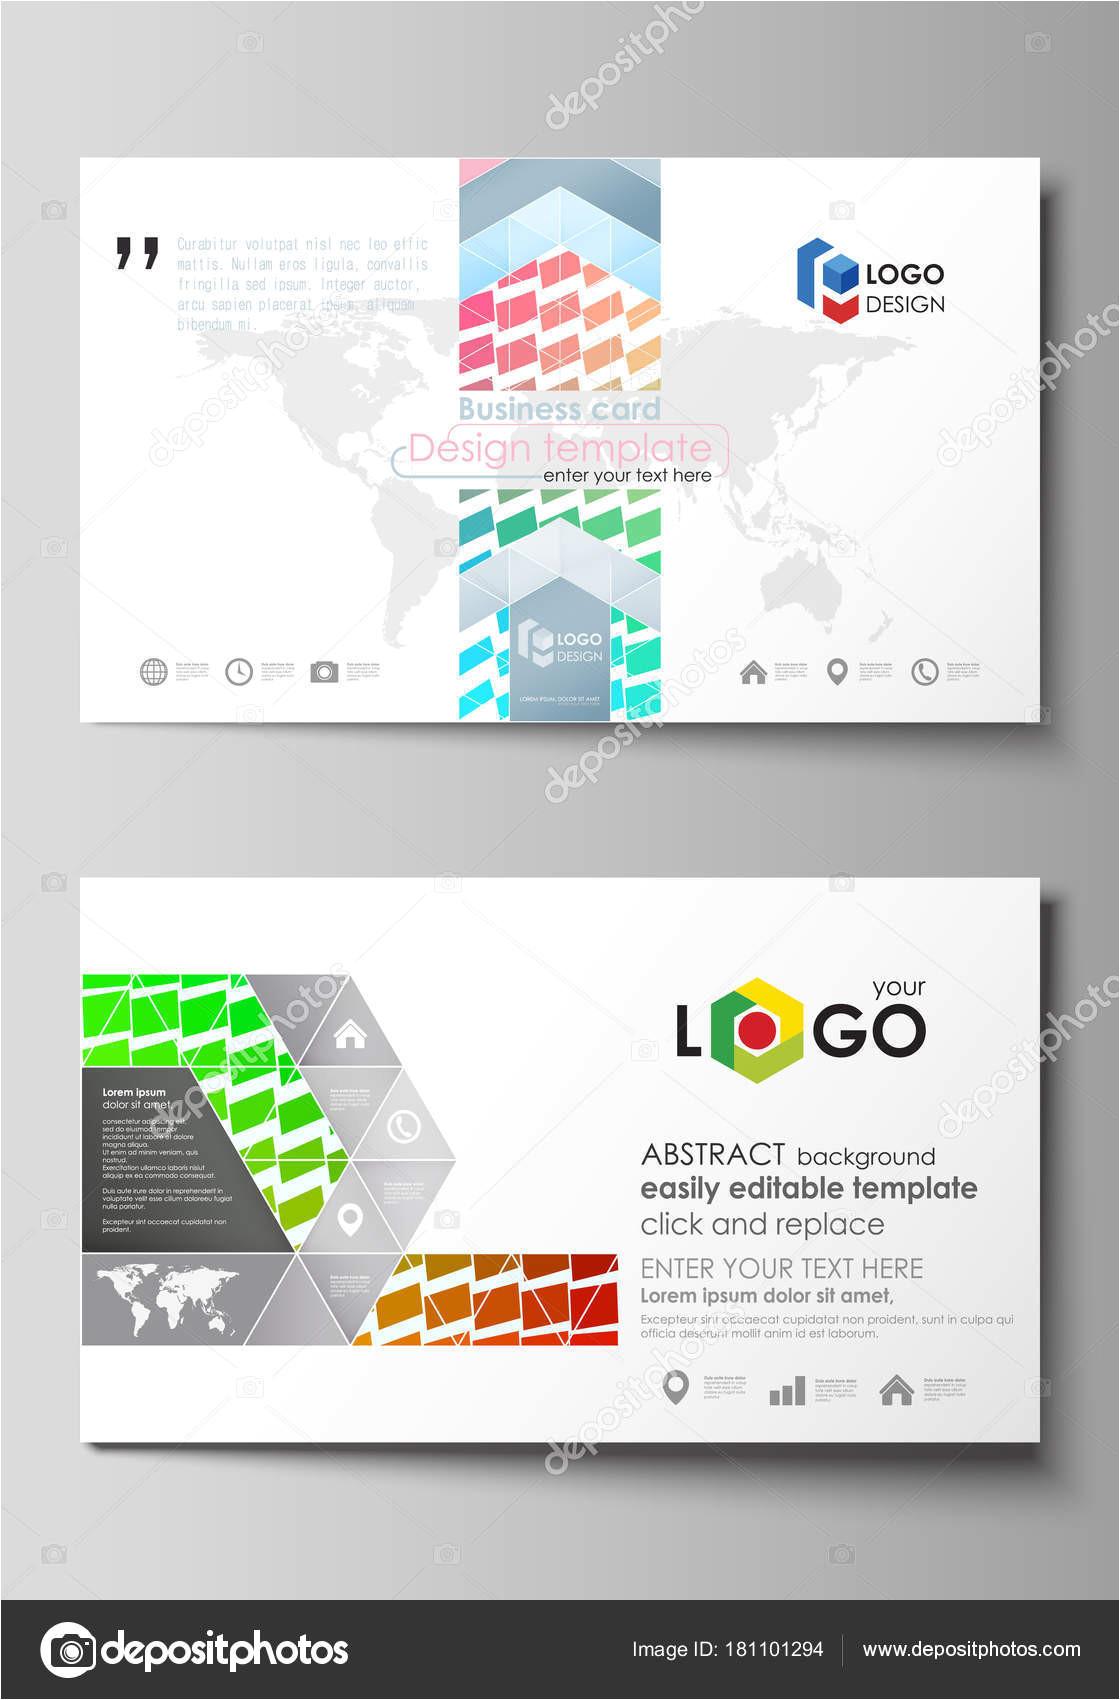 depositphotos 181101294 stock illustration business card templates easy editable jpg